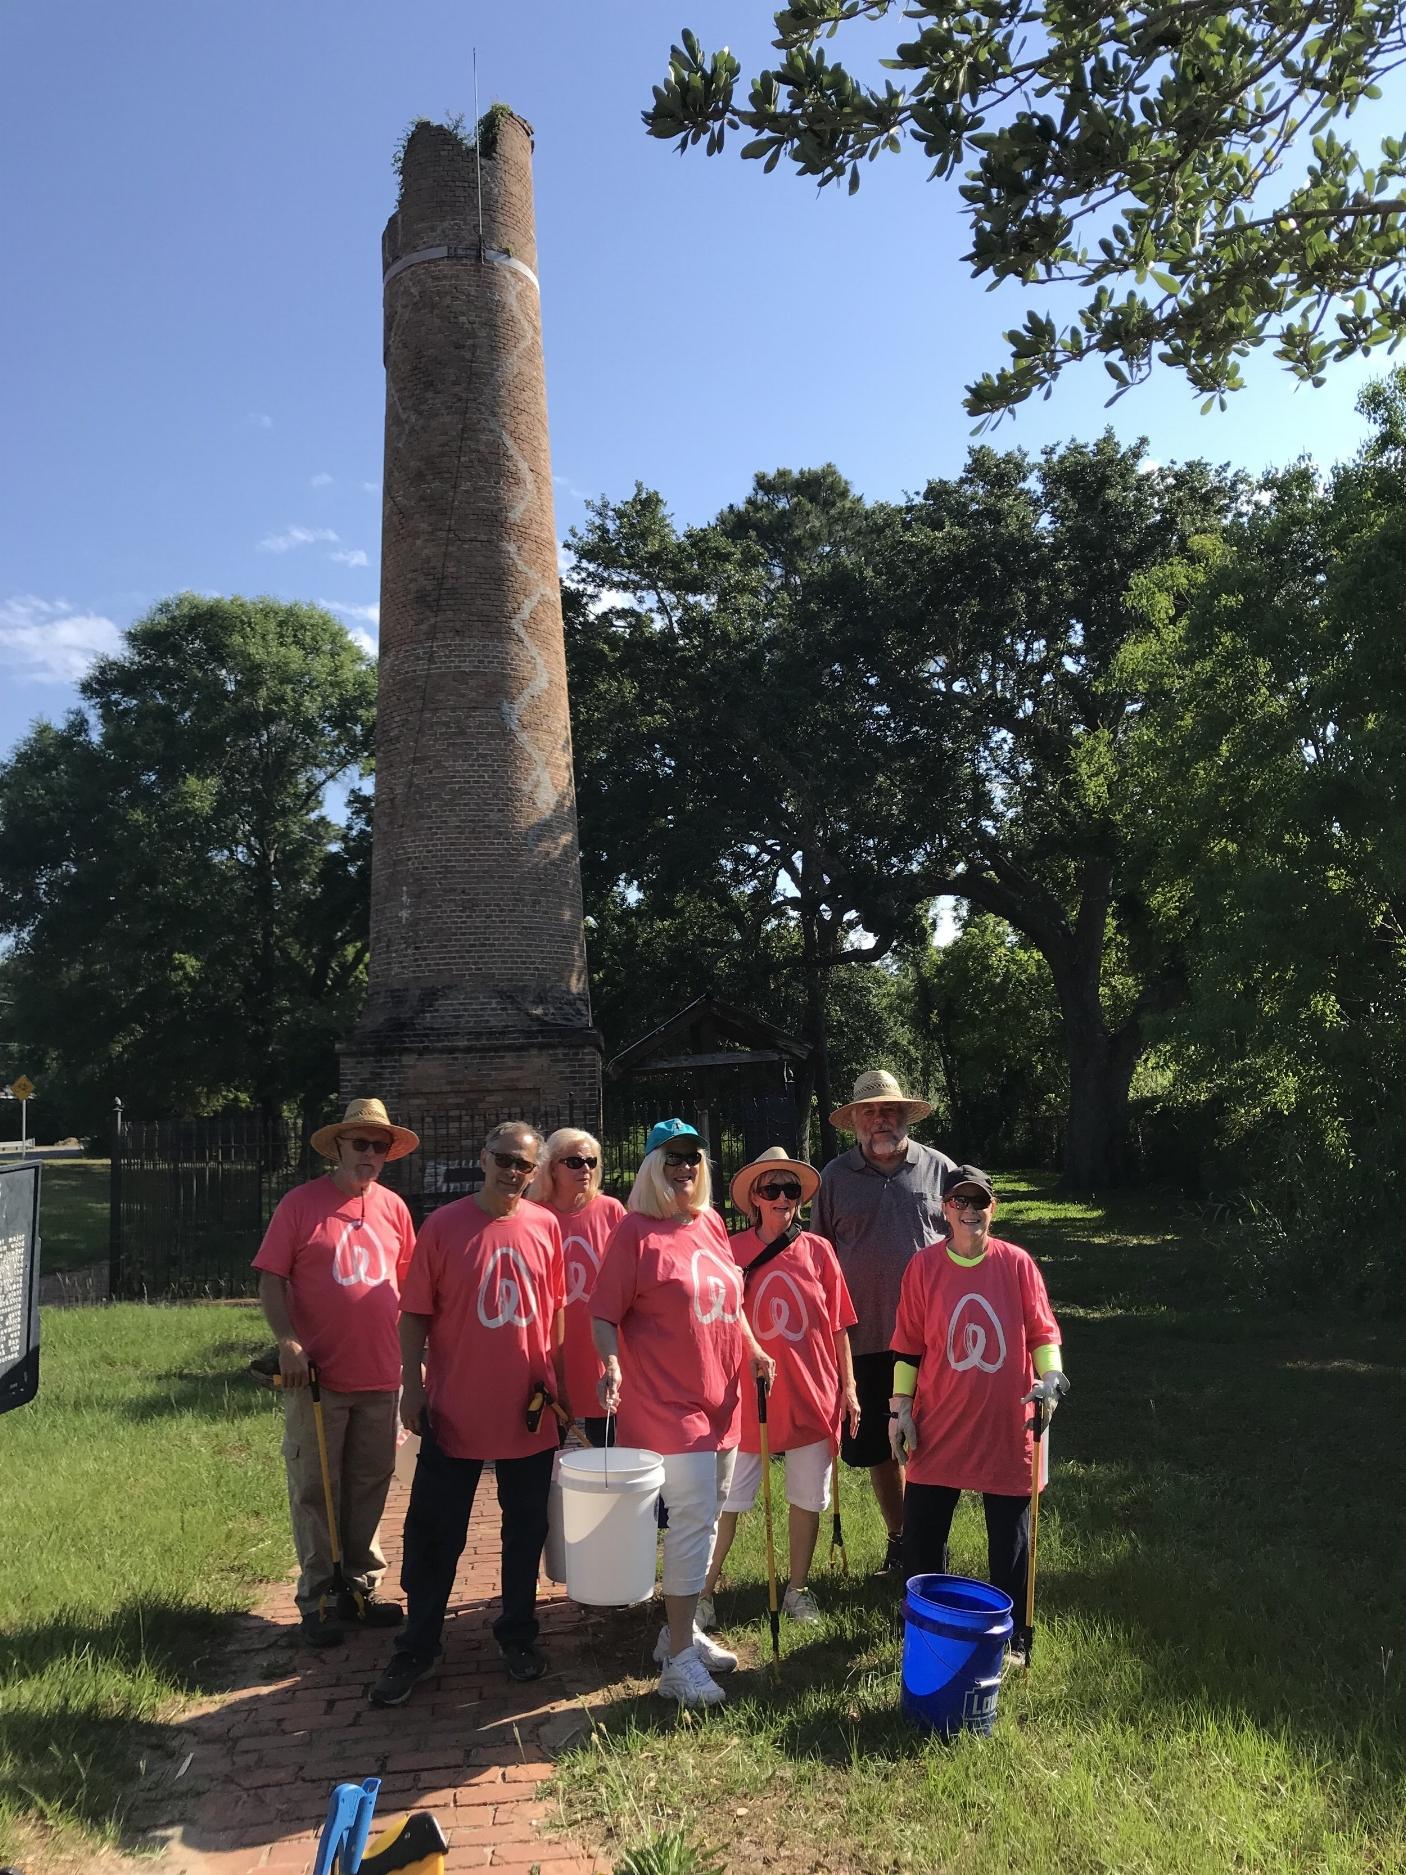 - 169 lbs of debris picked up by 29 volunteers on a beautiful Saturday moring